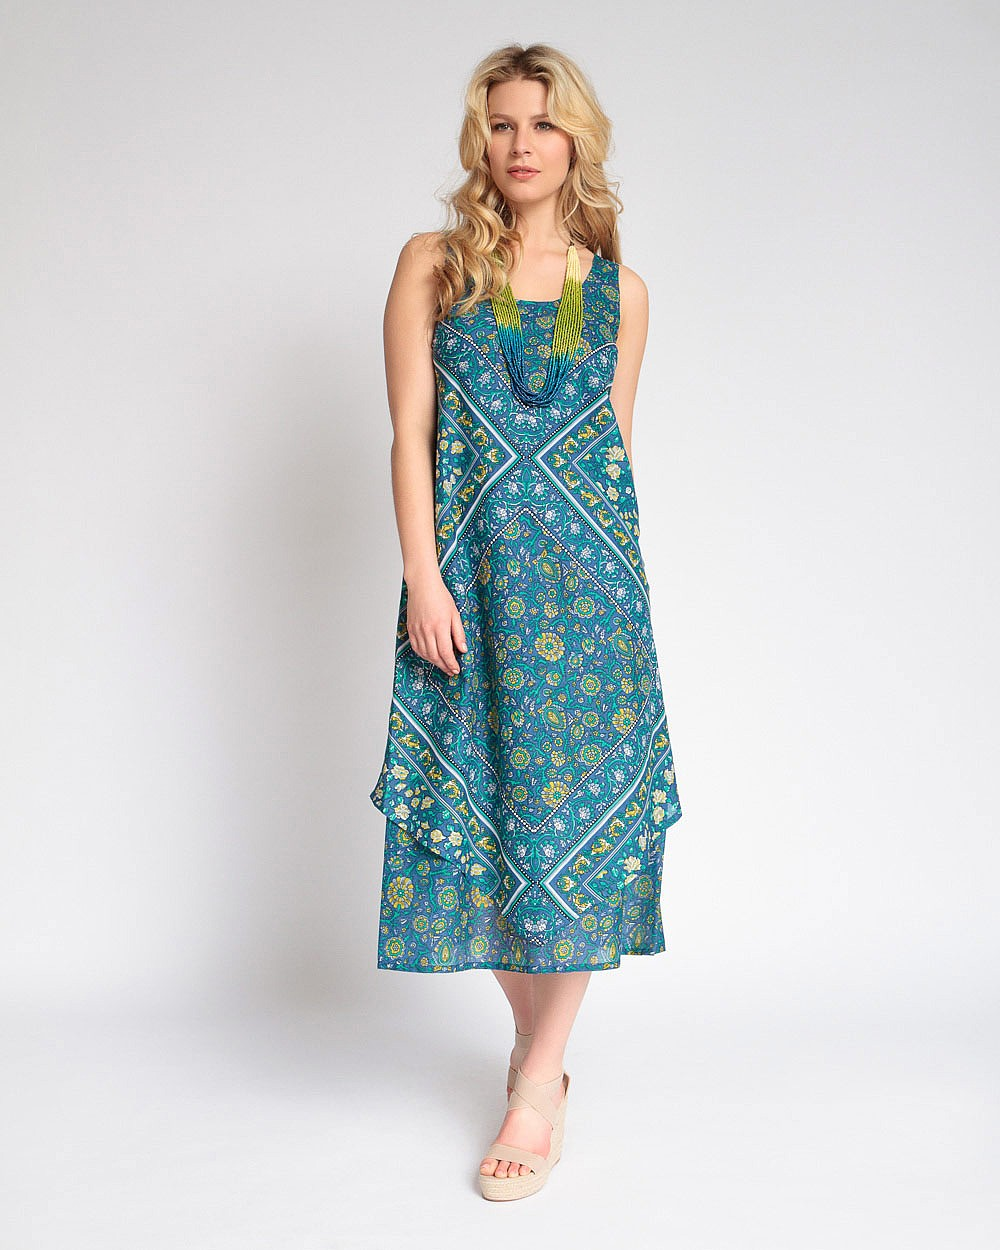 New East Amisha Print Dress Sleeveless w/Scoop Neck Handkerchief Hem Cotton Blue